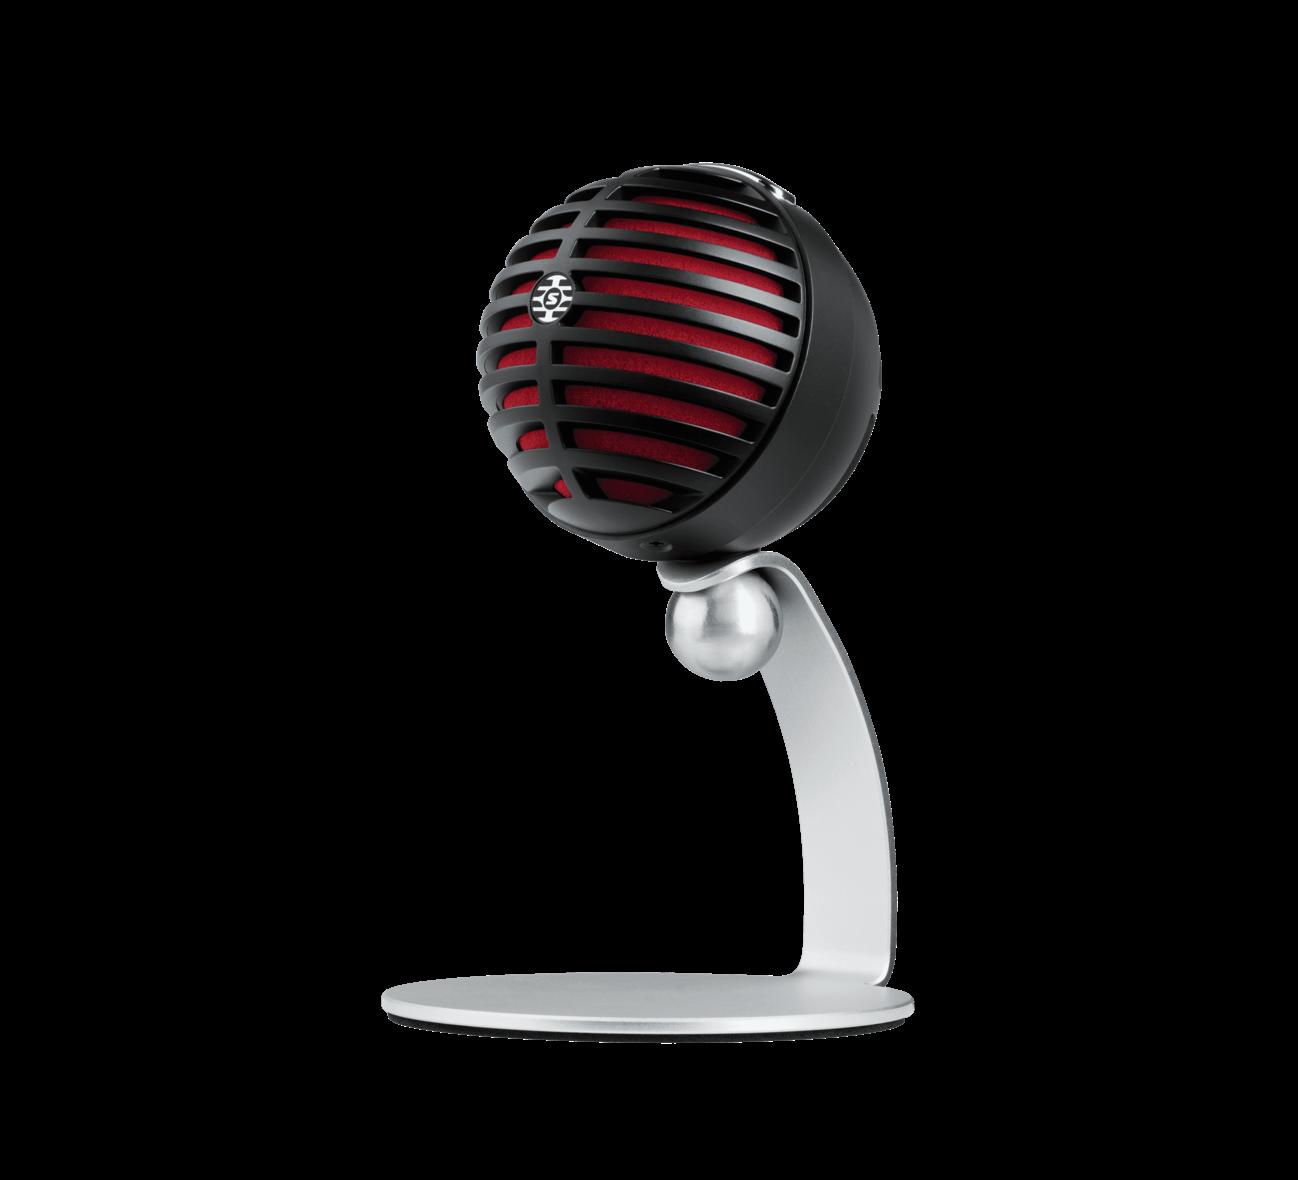 Shure MV5 Digital USB Condenser Microphone, Black